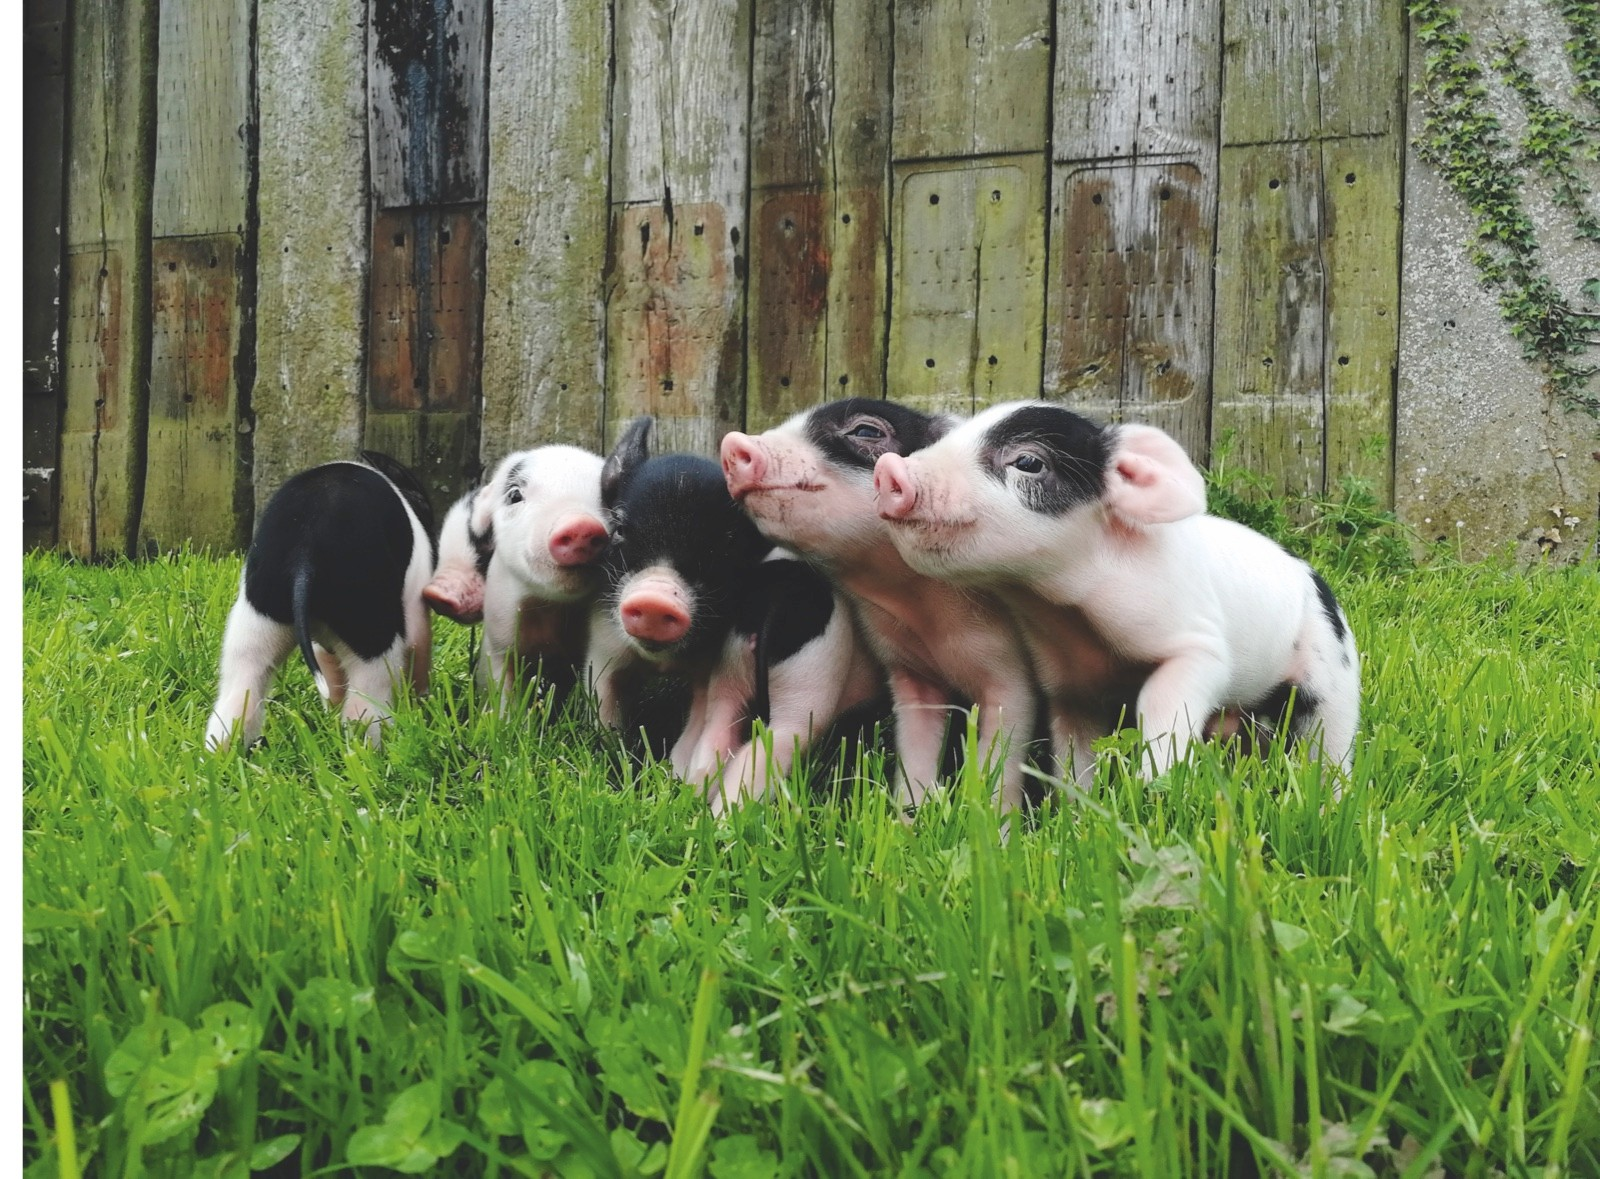 Glamrock-pigs-46971ae